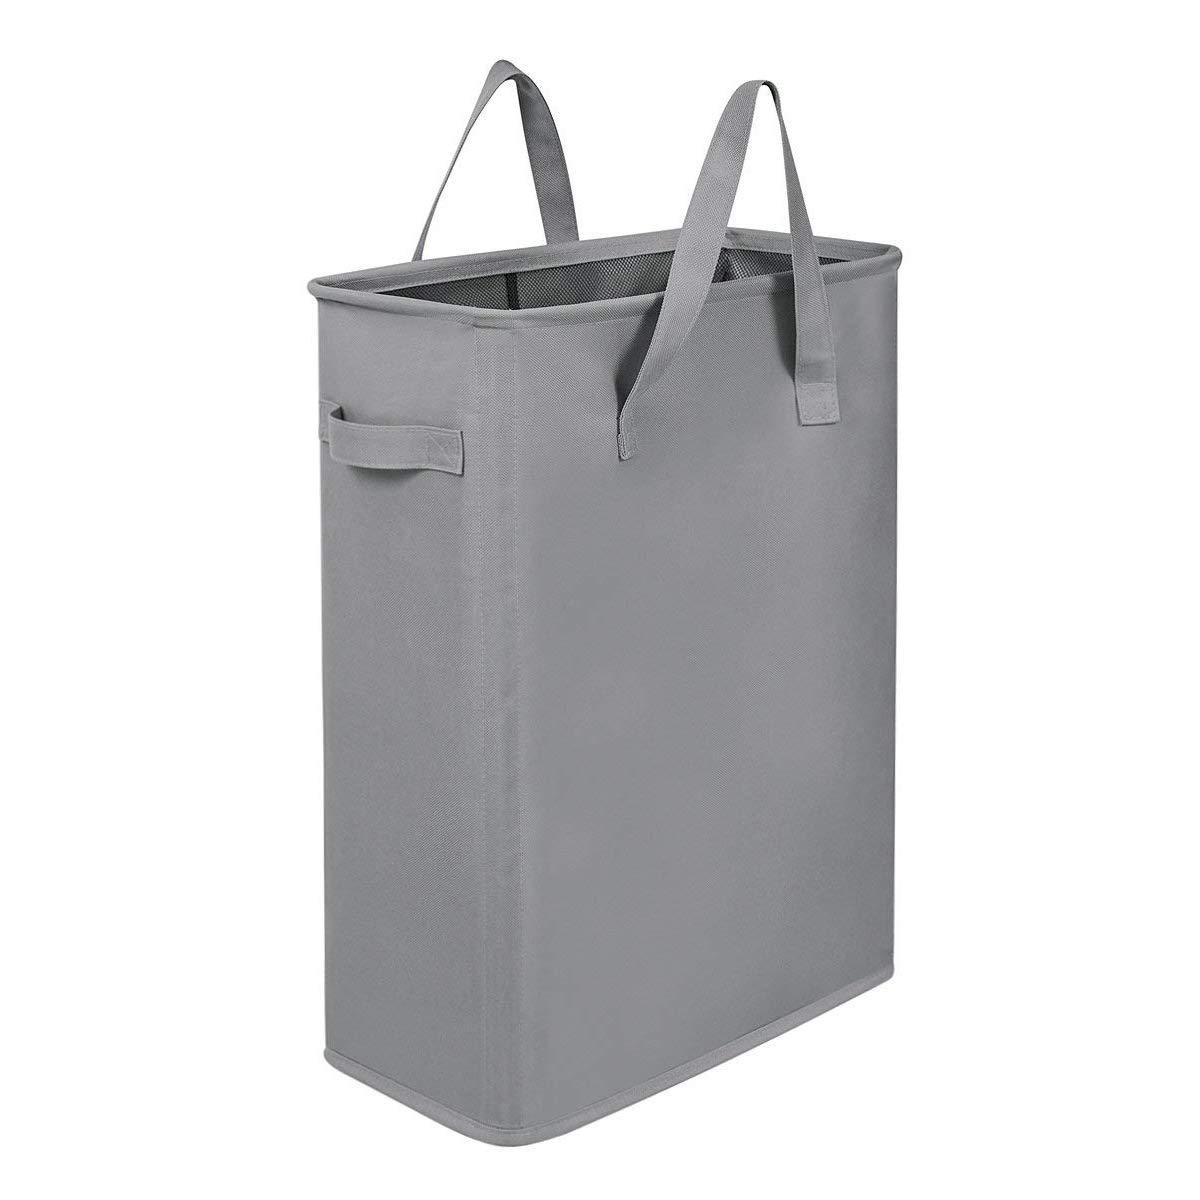 Chrislley Slim Laundry Basket Hamper Handy Foldable Bag Handle Collapsible Oxford Cloth Basket Bin Organizer 44.5L(Grey)